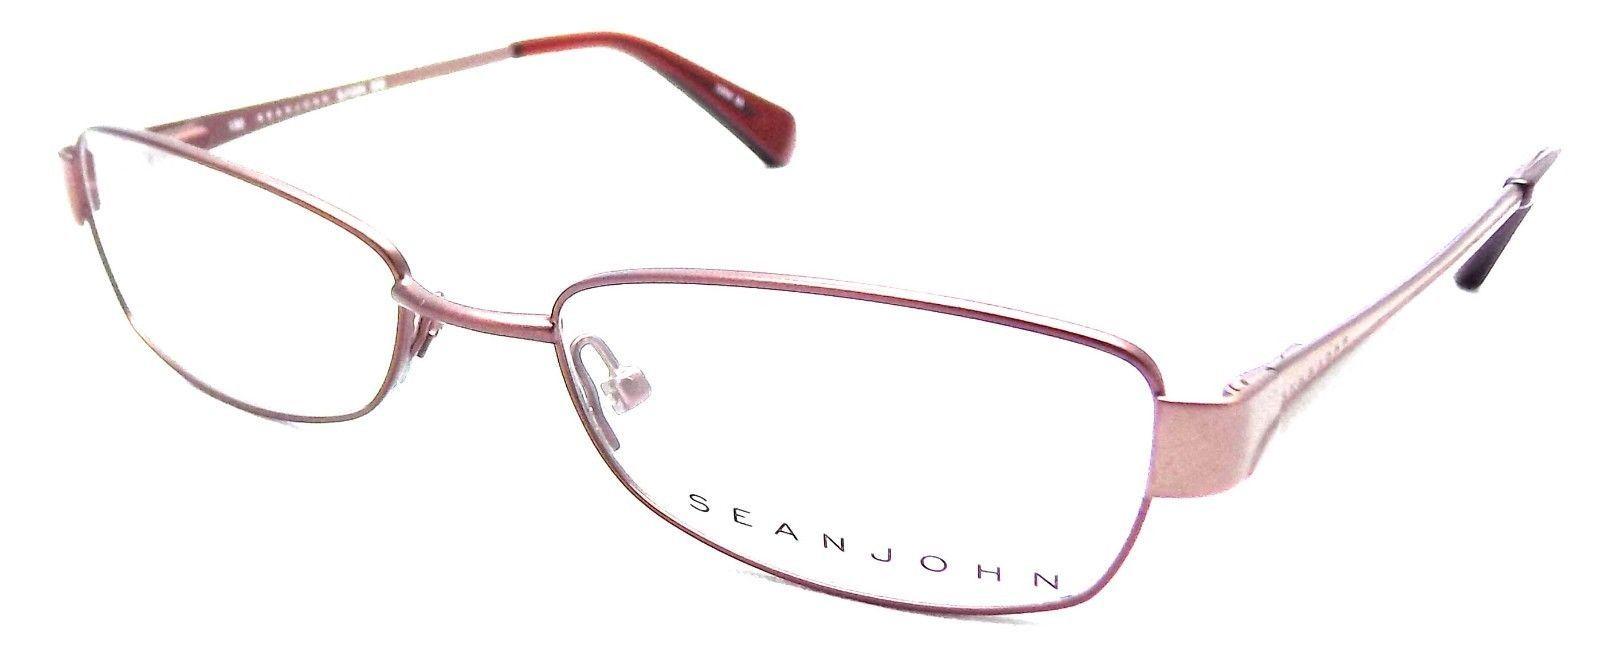 Sean John SJ1034 609 Rx Eyeglasses Frames and 10 similar items